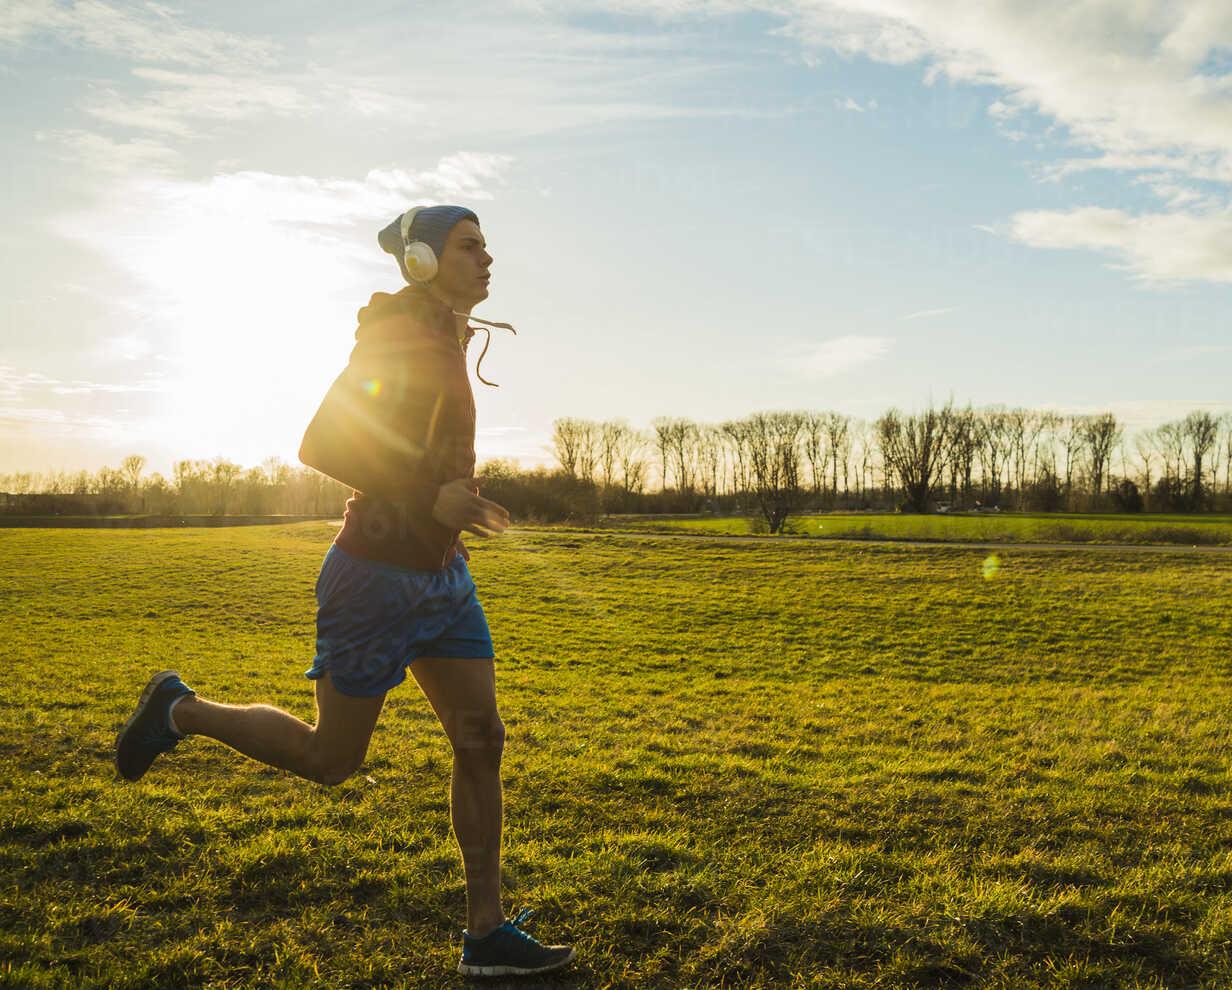 Germany, Mannheim, young man jogging in meadow - UUF003638 - Uwe Umstätter/Westend61